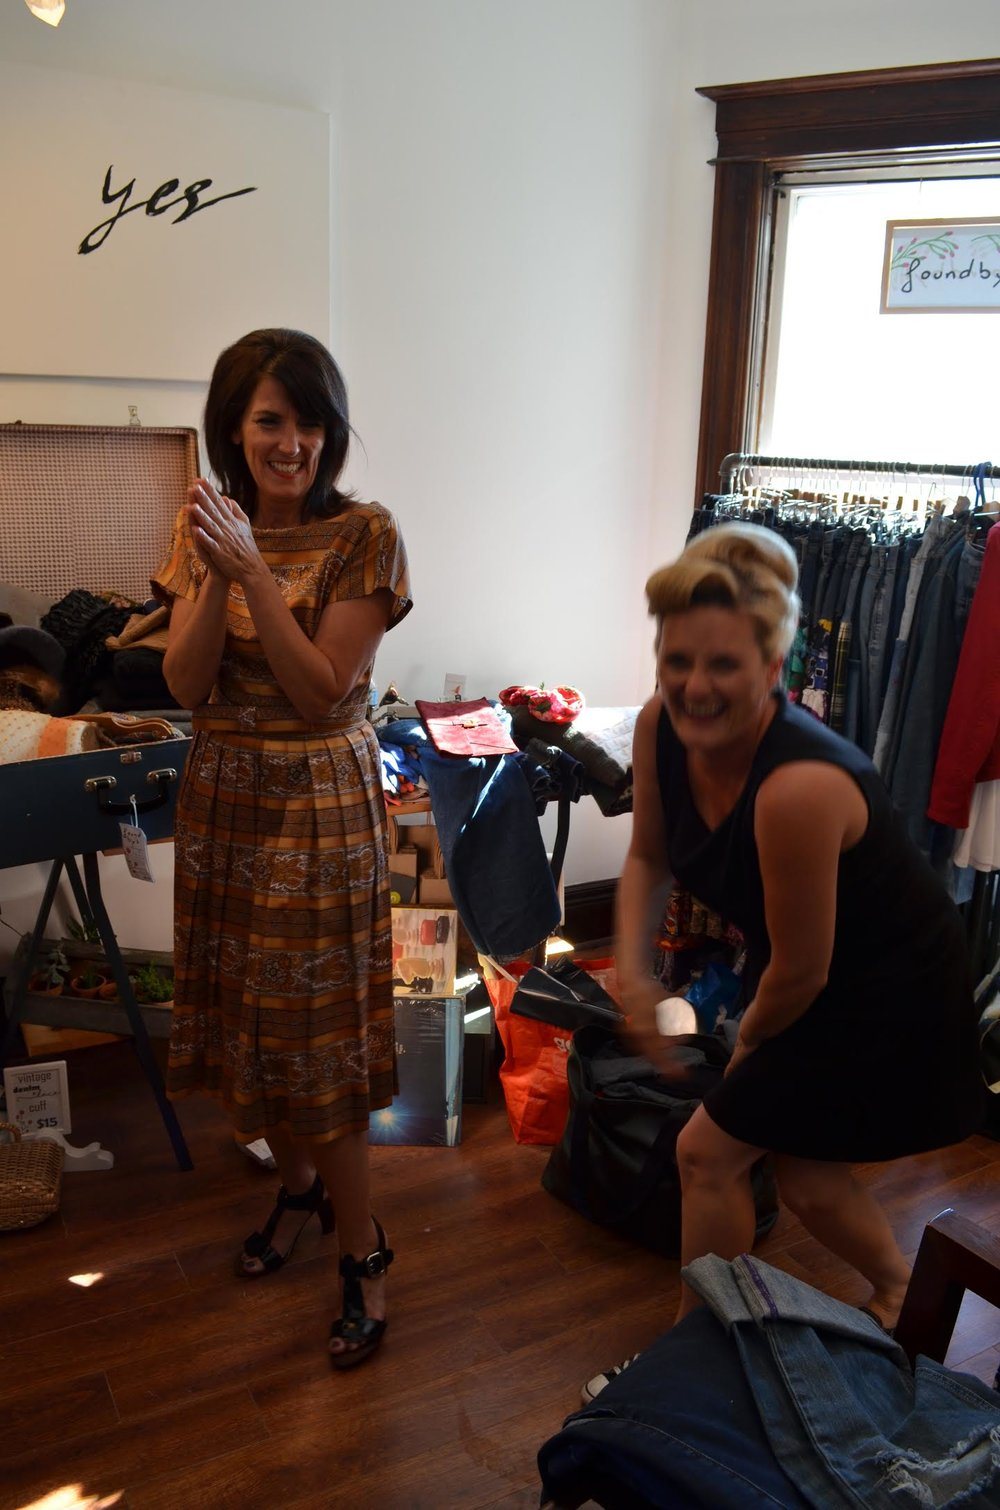 LadyBoss_FemaleEntrepreneurs_Lifestyle